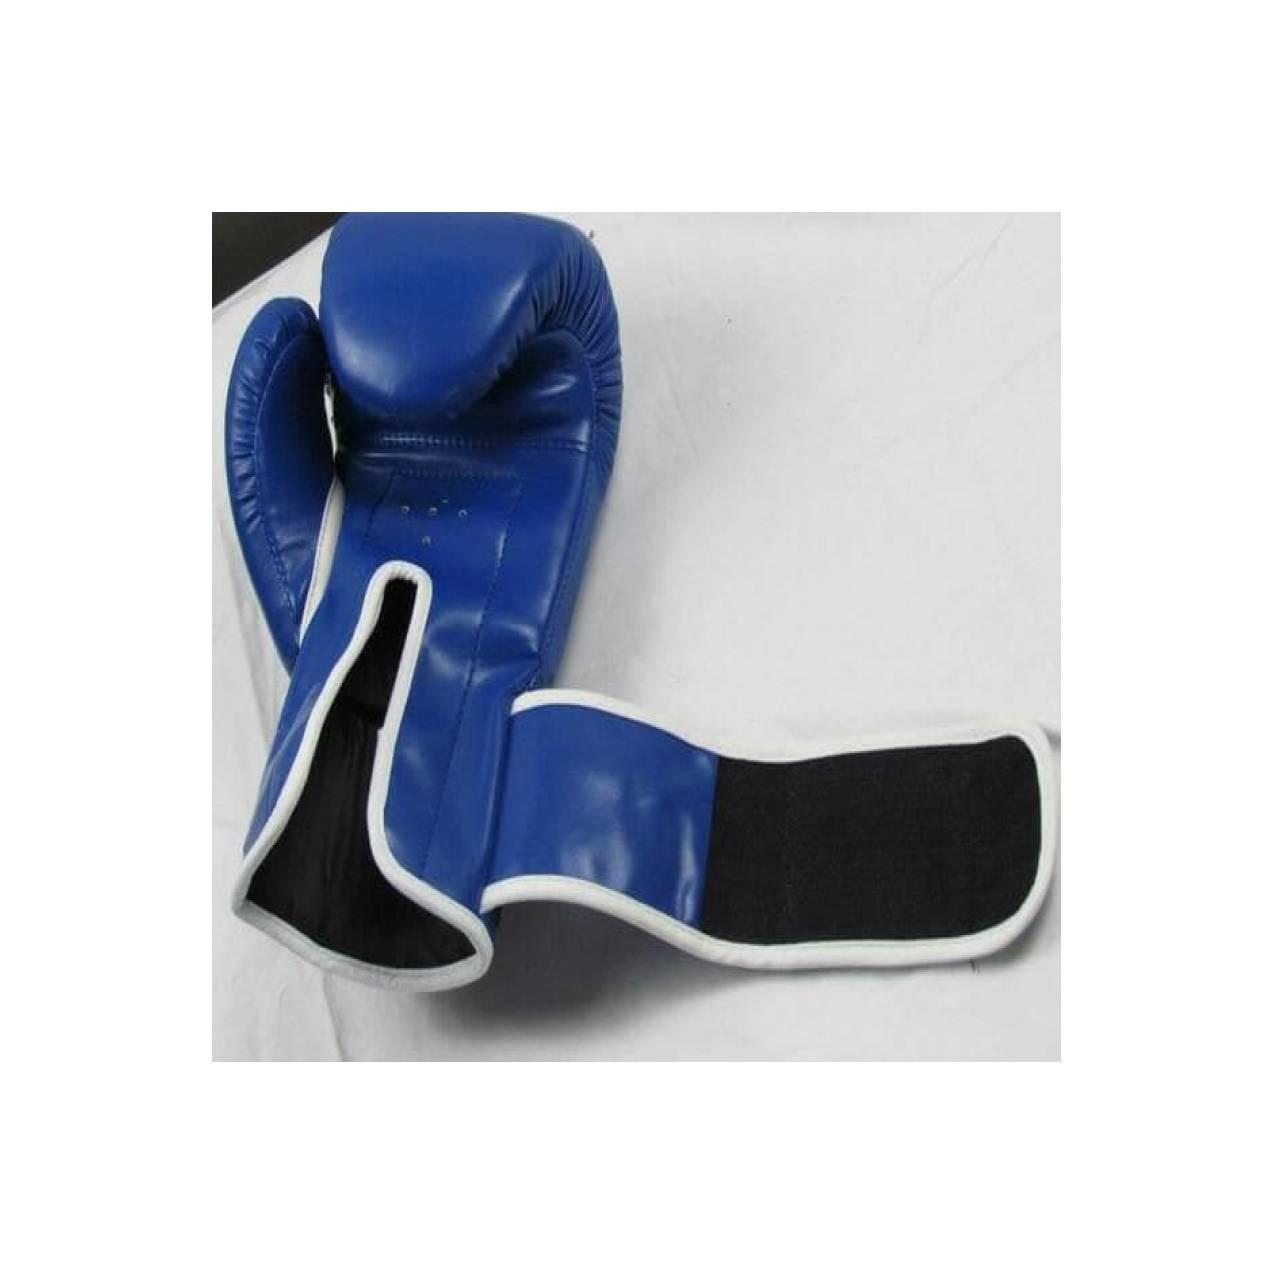 sarung tangan tinju / muaythai /boxing anak dan dewasa everlast